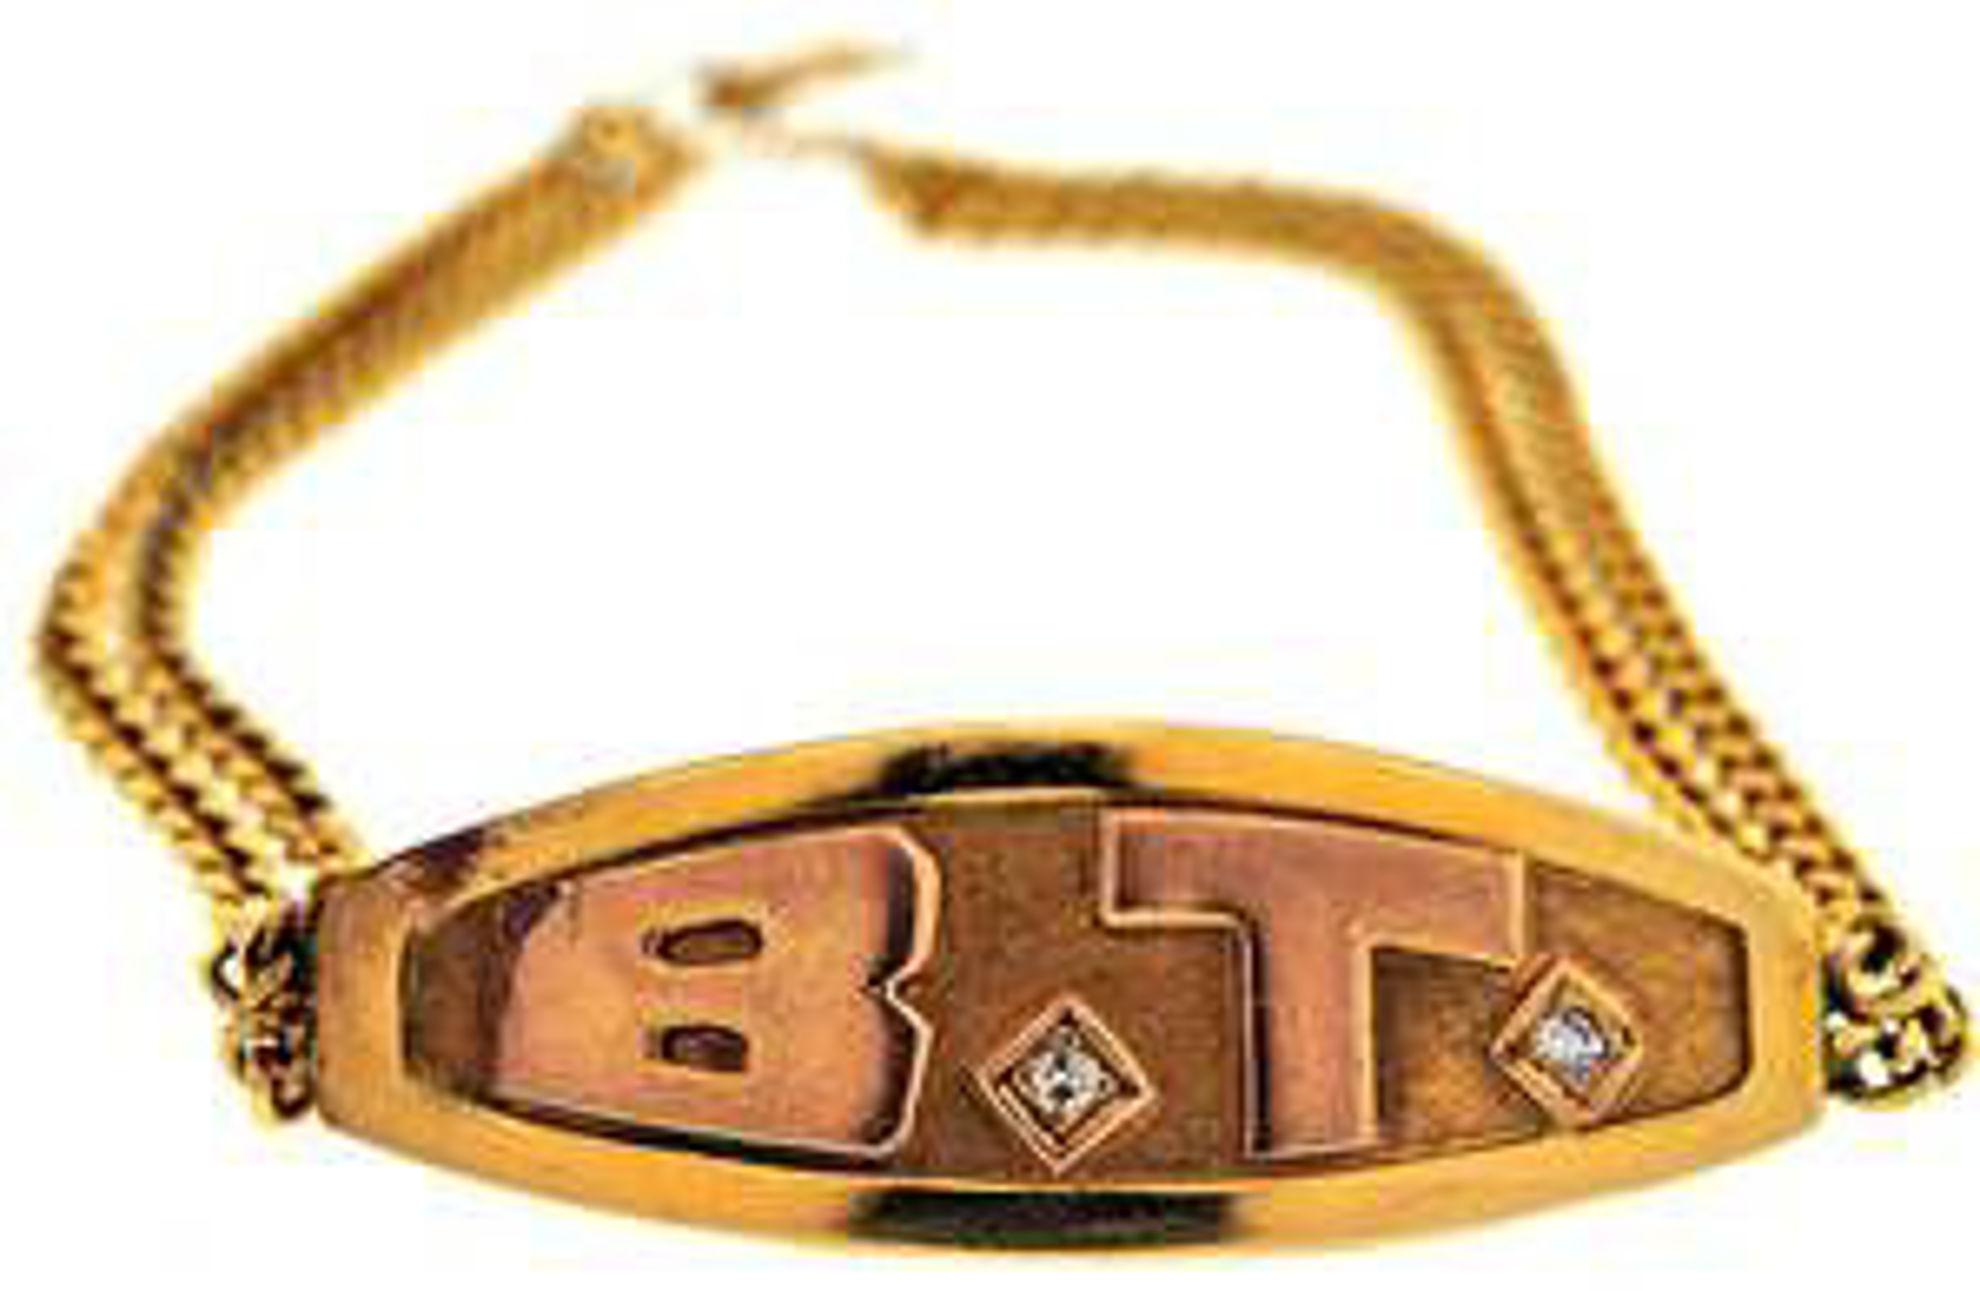 Picture of Men's Bracelets 14kt-4.5 DWT, 7.0 Grams